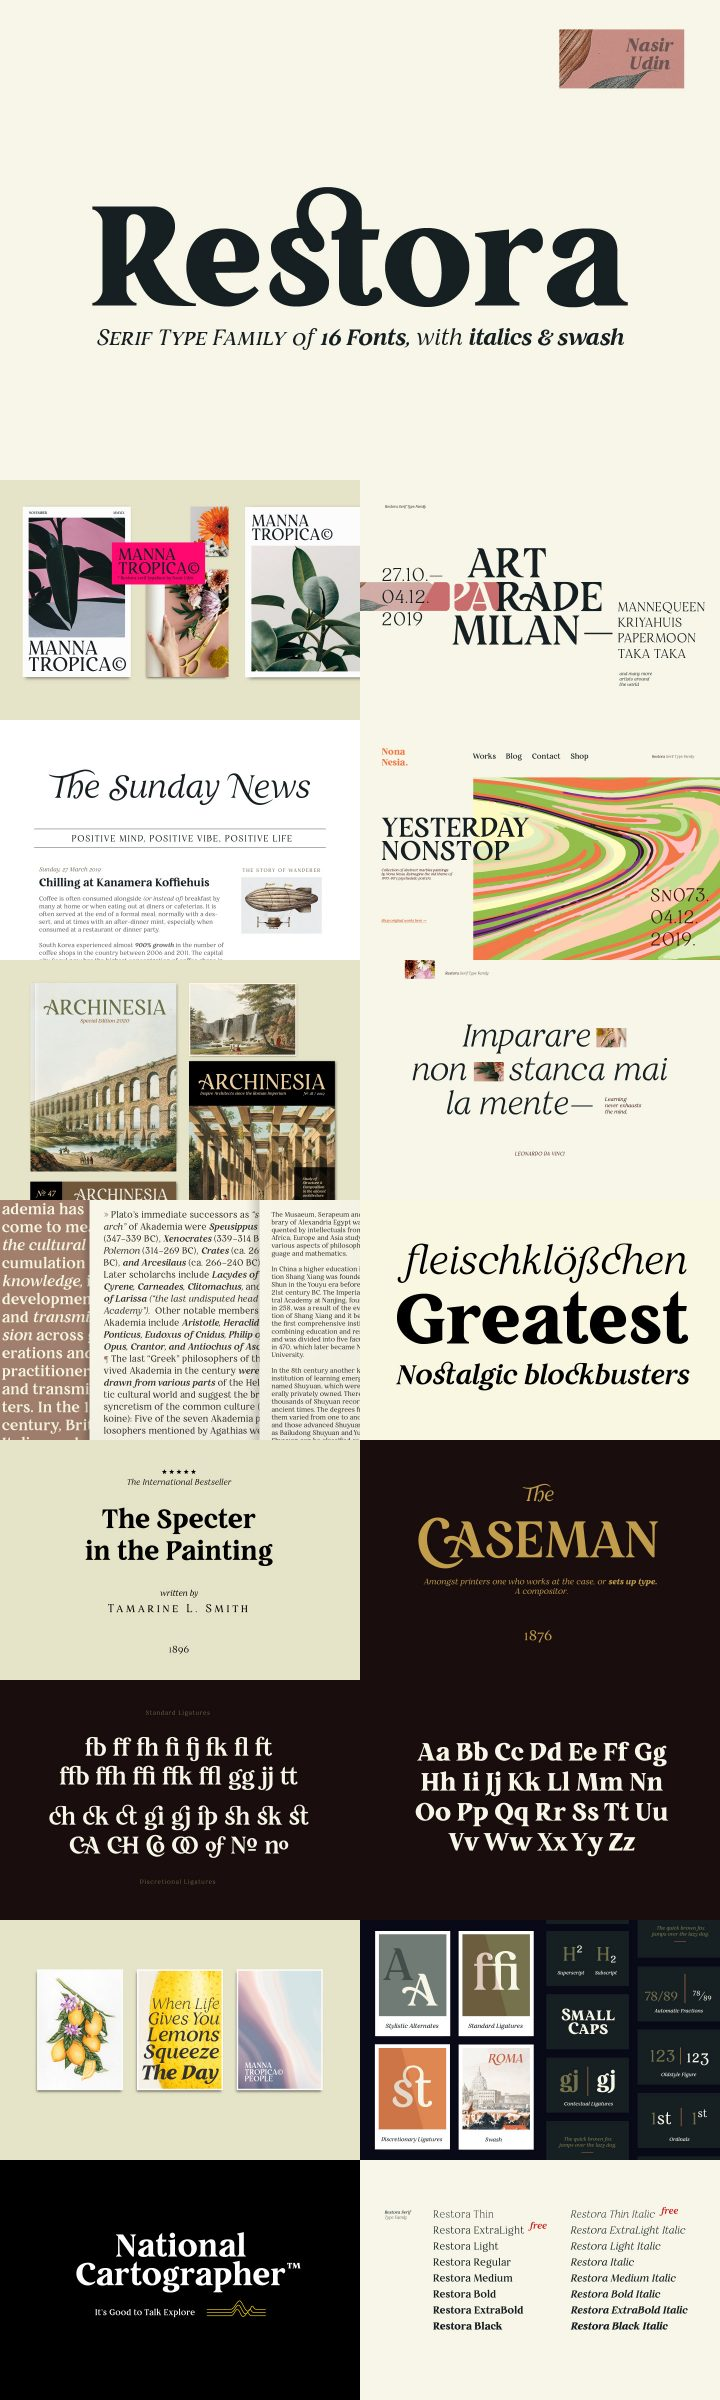 RESTORA - Typographie serif gratuite OLD-STYLE 2